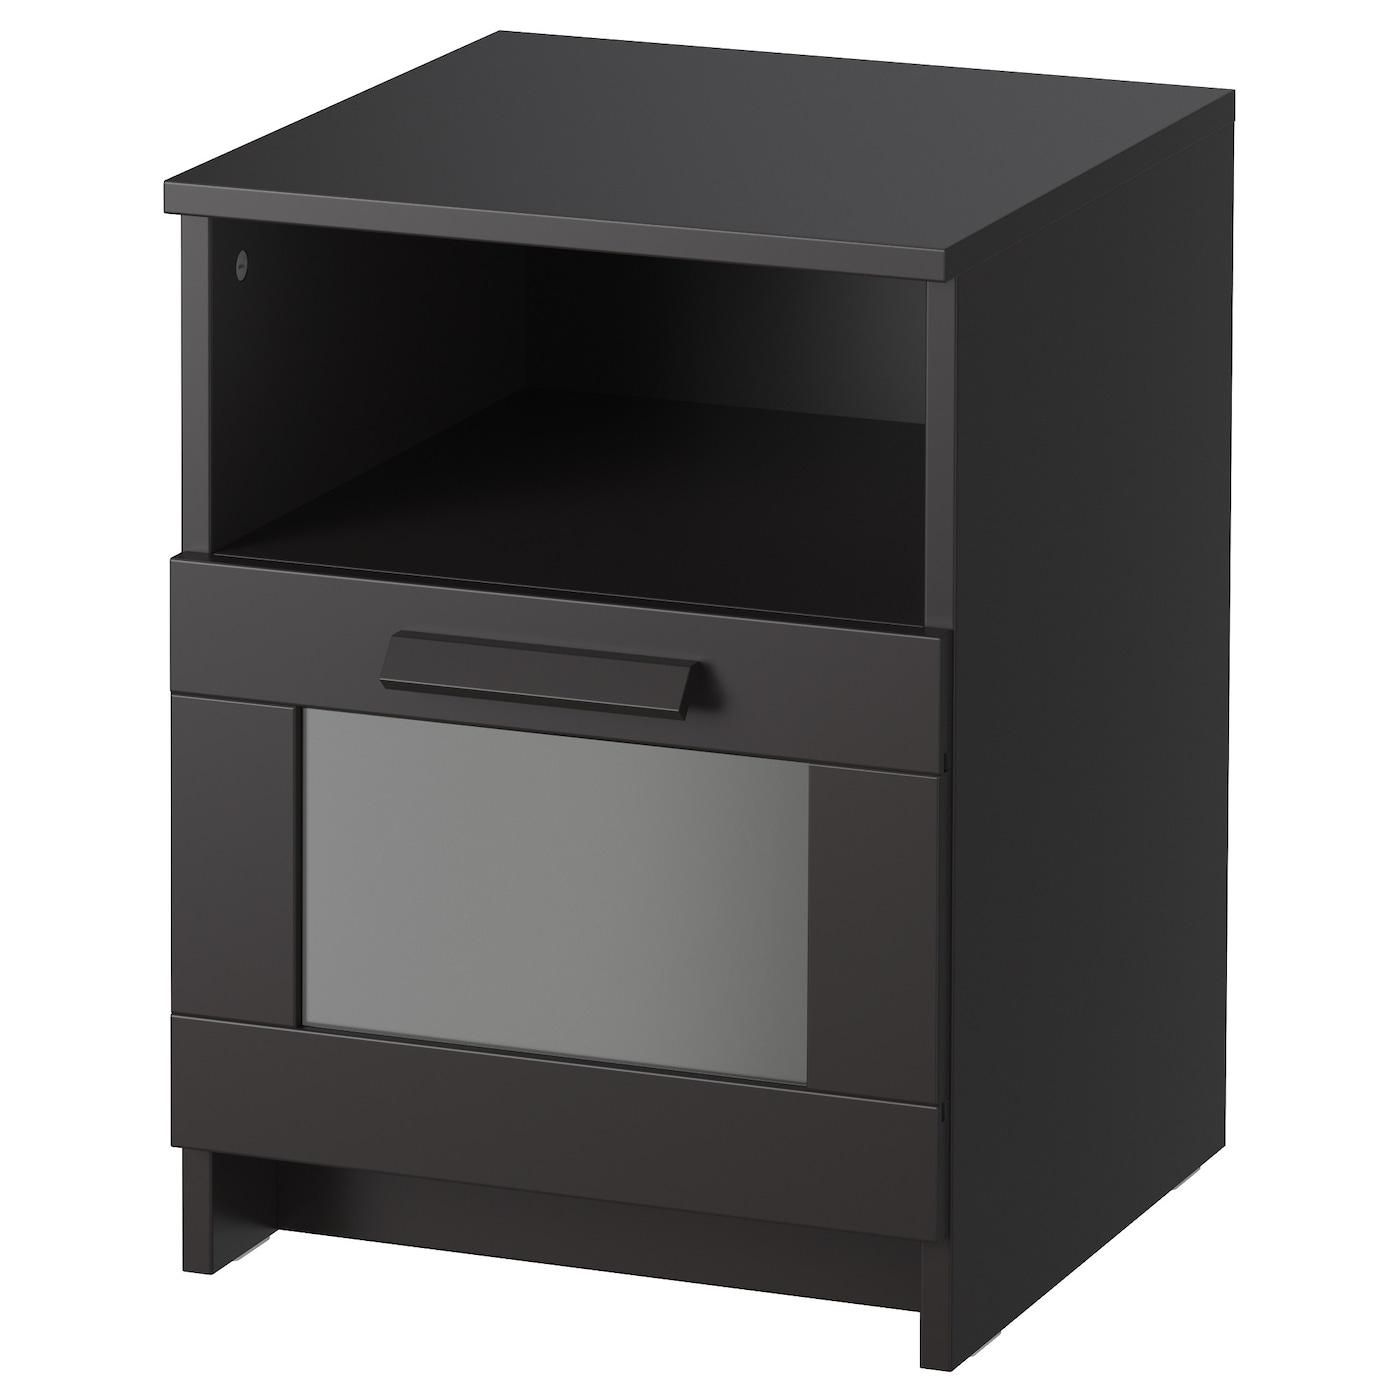 BRIMNES Nachtkastje Zwart 39 x 41 cm IKEA